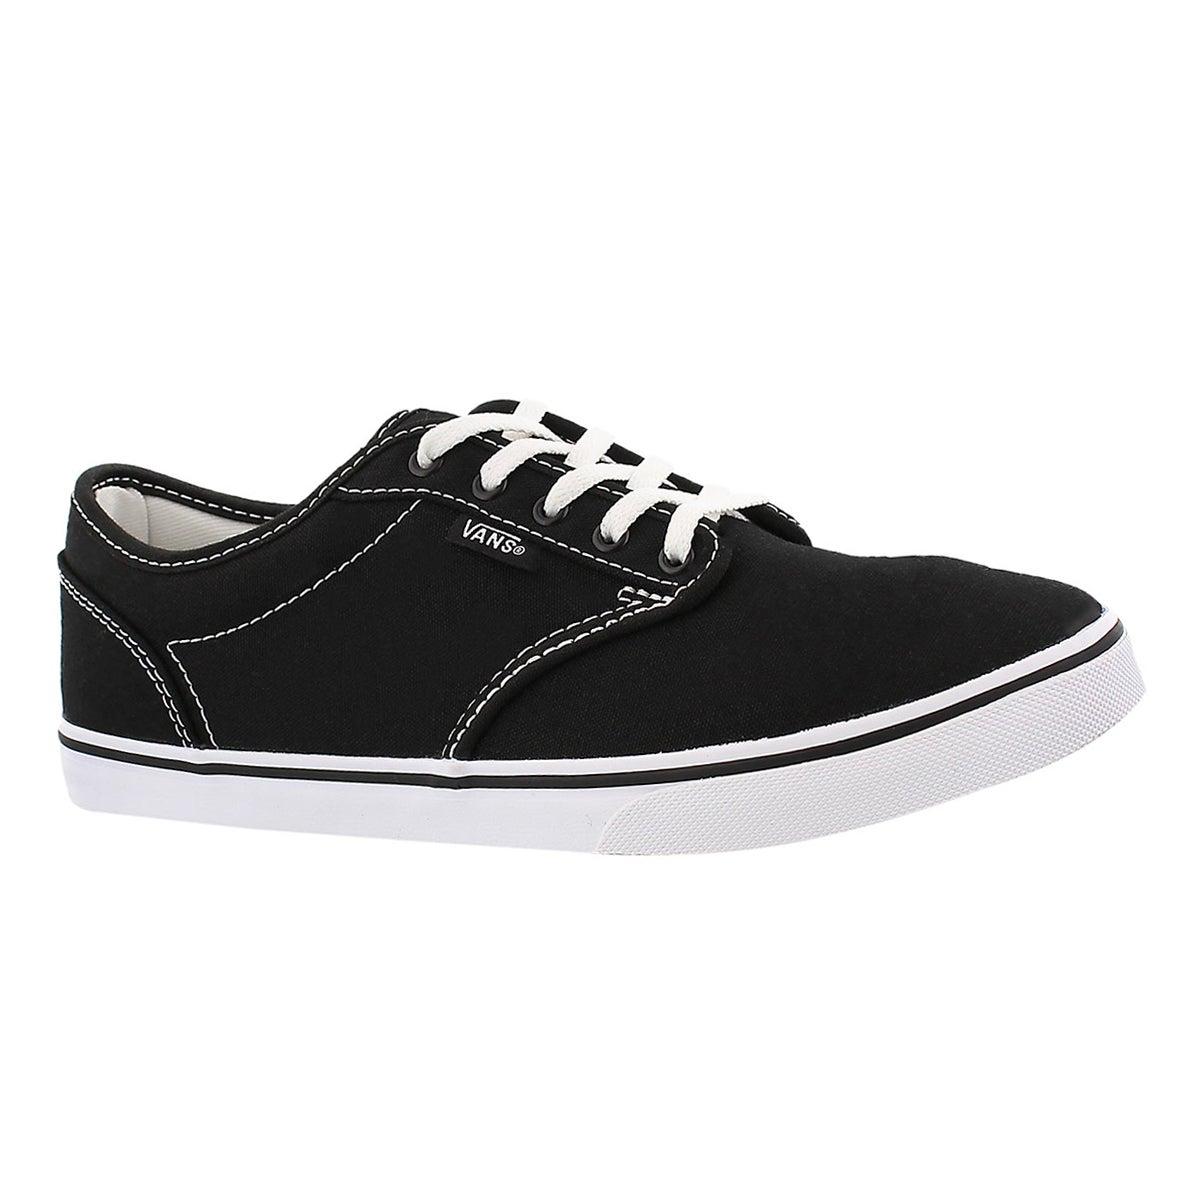 Women's Atwood Low Sneaker - Black/White